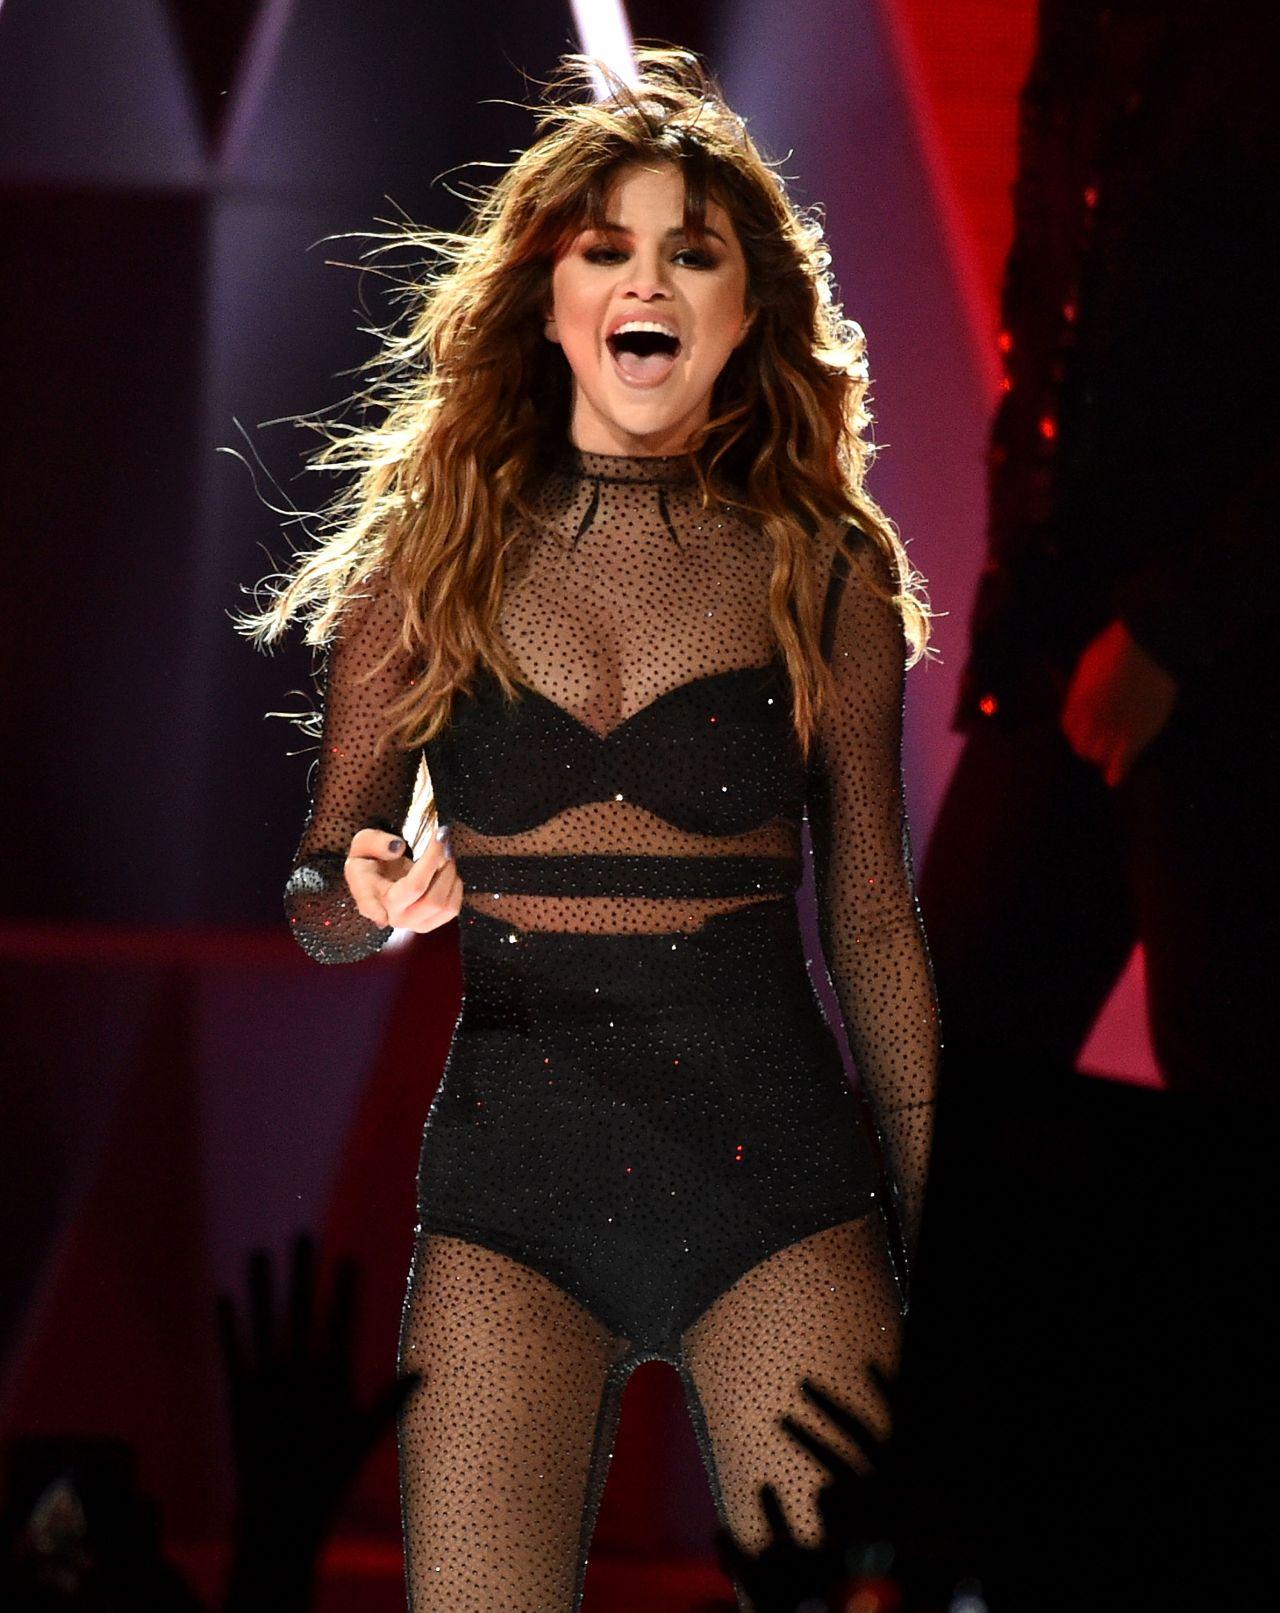 Selena Gomez photo gallery - page #3 | Celebs-Place.com